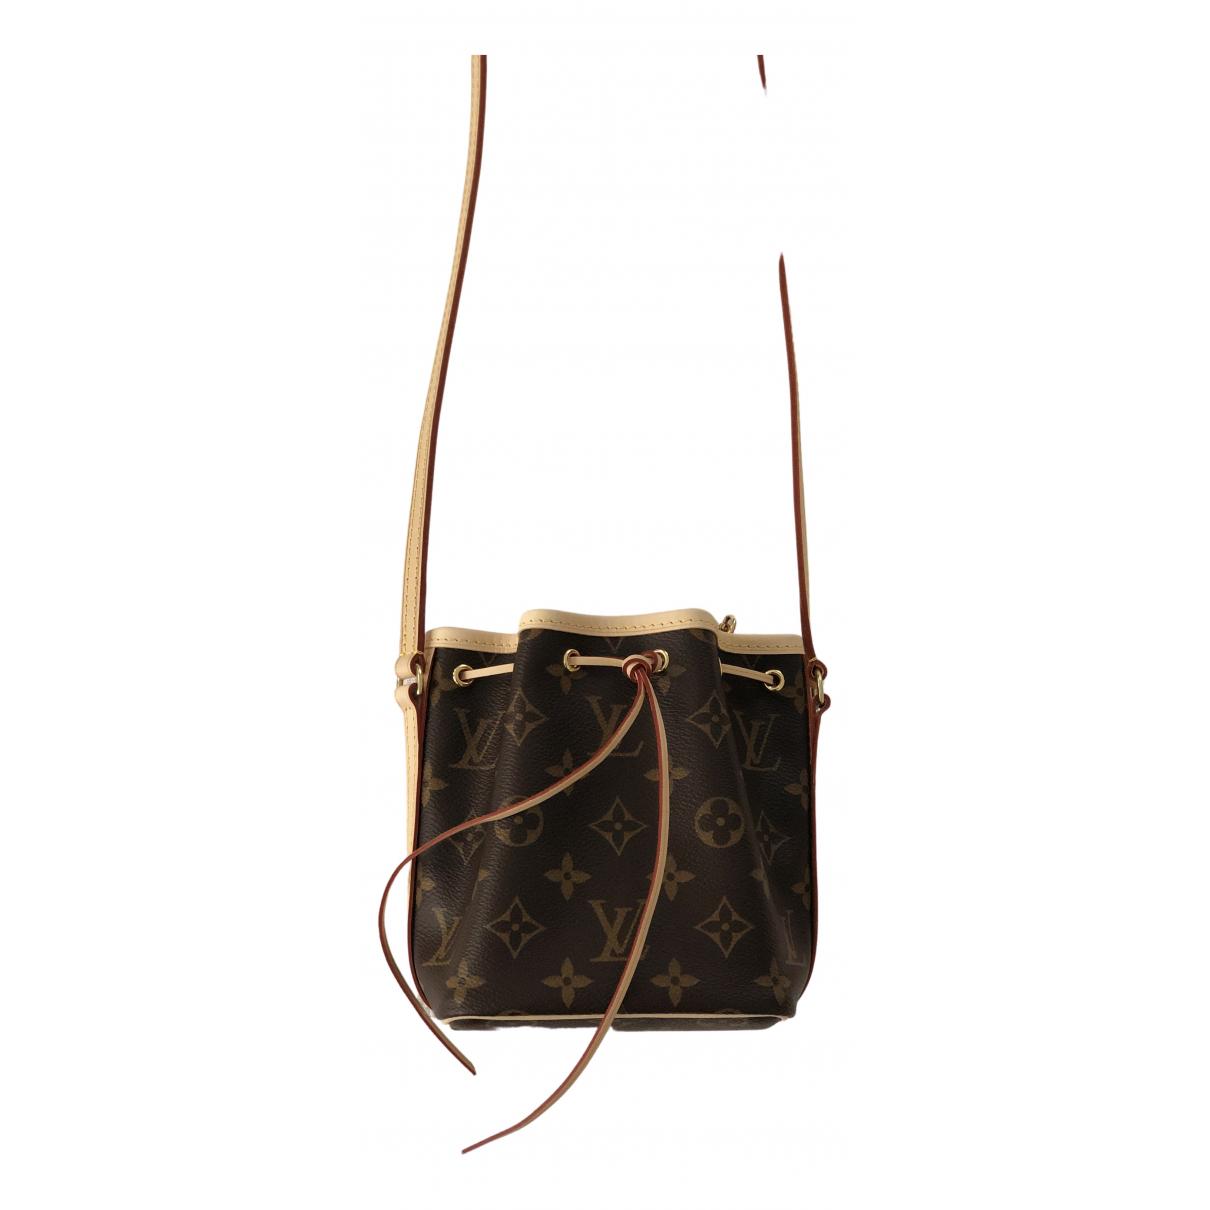 Louis Vuitton Noe Handtasche in Leinen